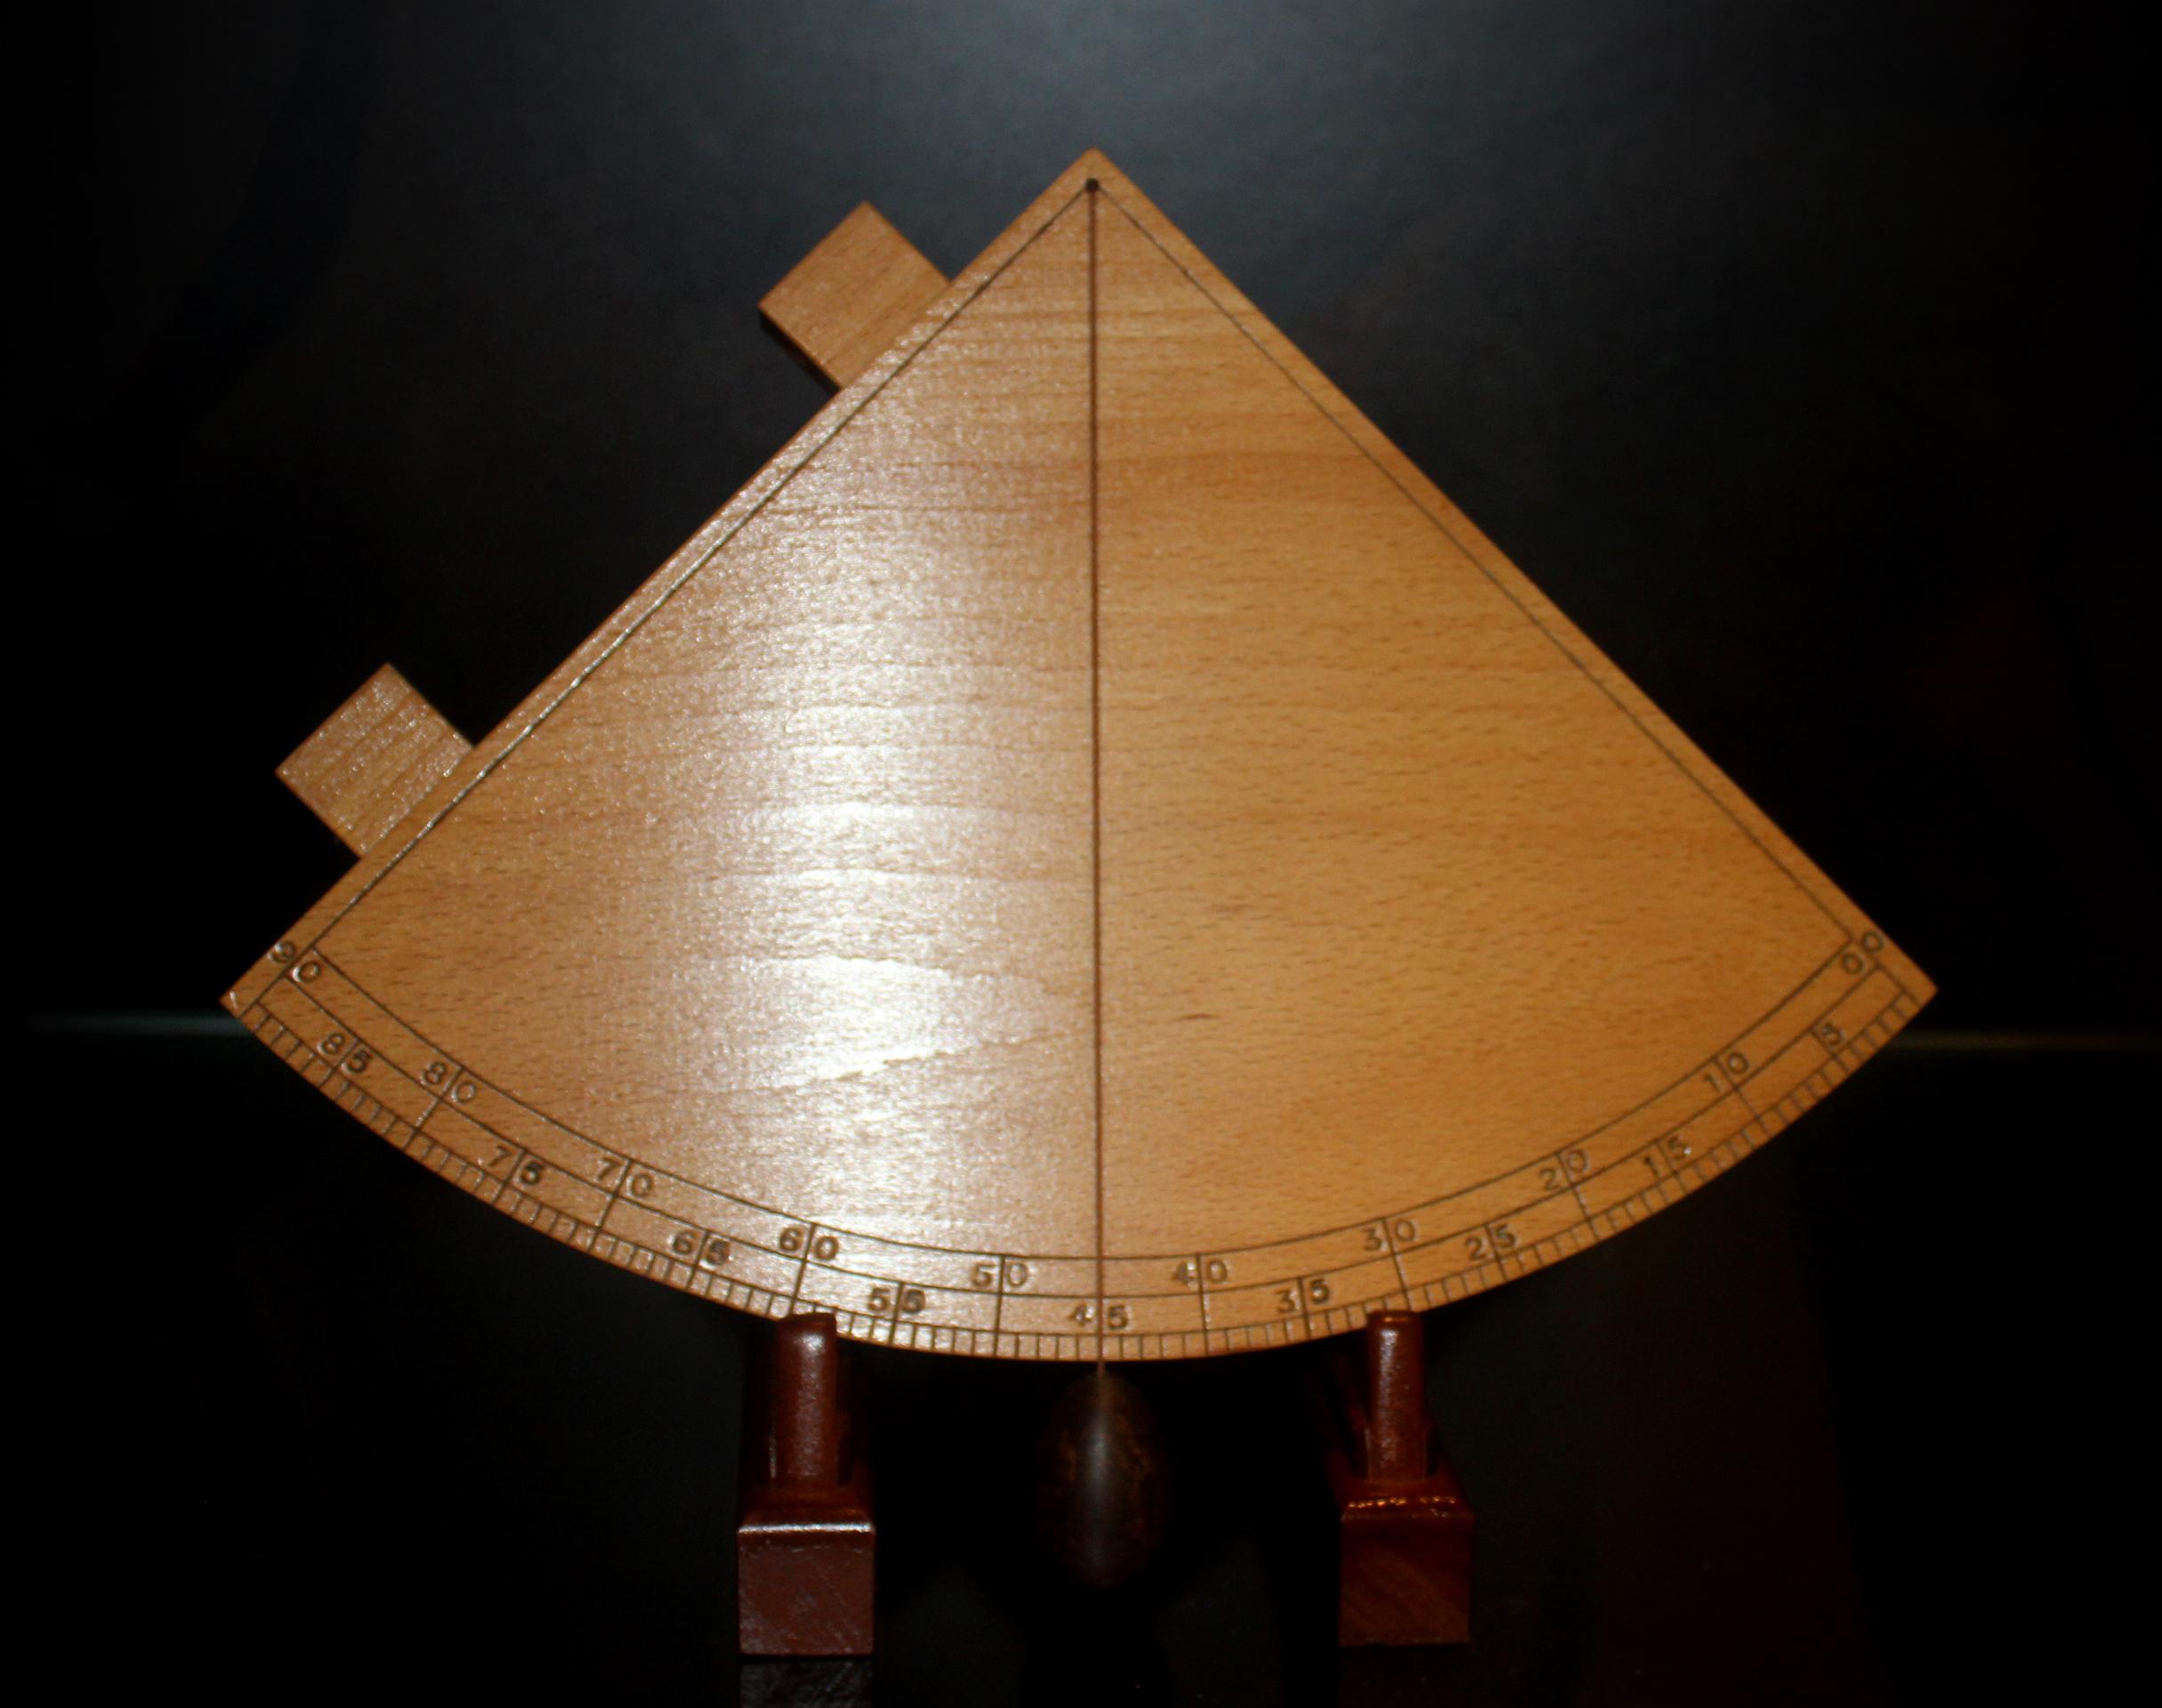 16th-Century Portuguese Nautical Sextant - European Age of Discovery, Antique, Navigator, Portugal, Oporto, HQ Photo